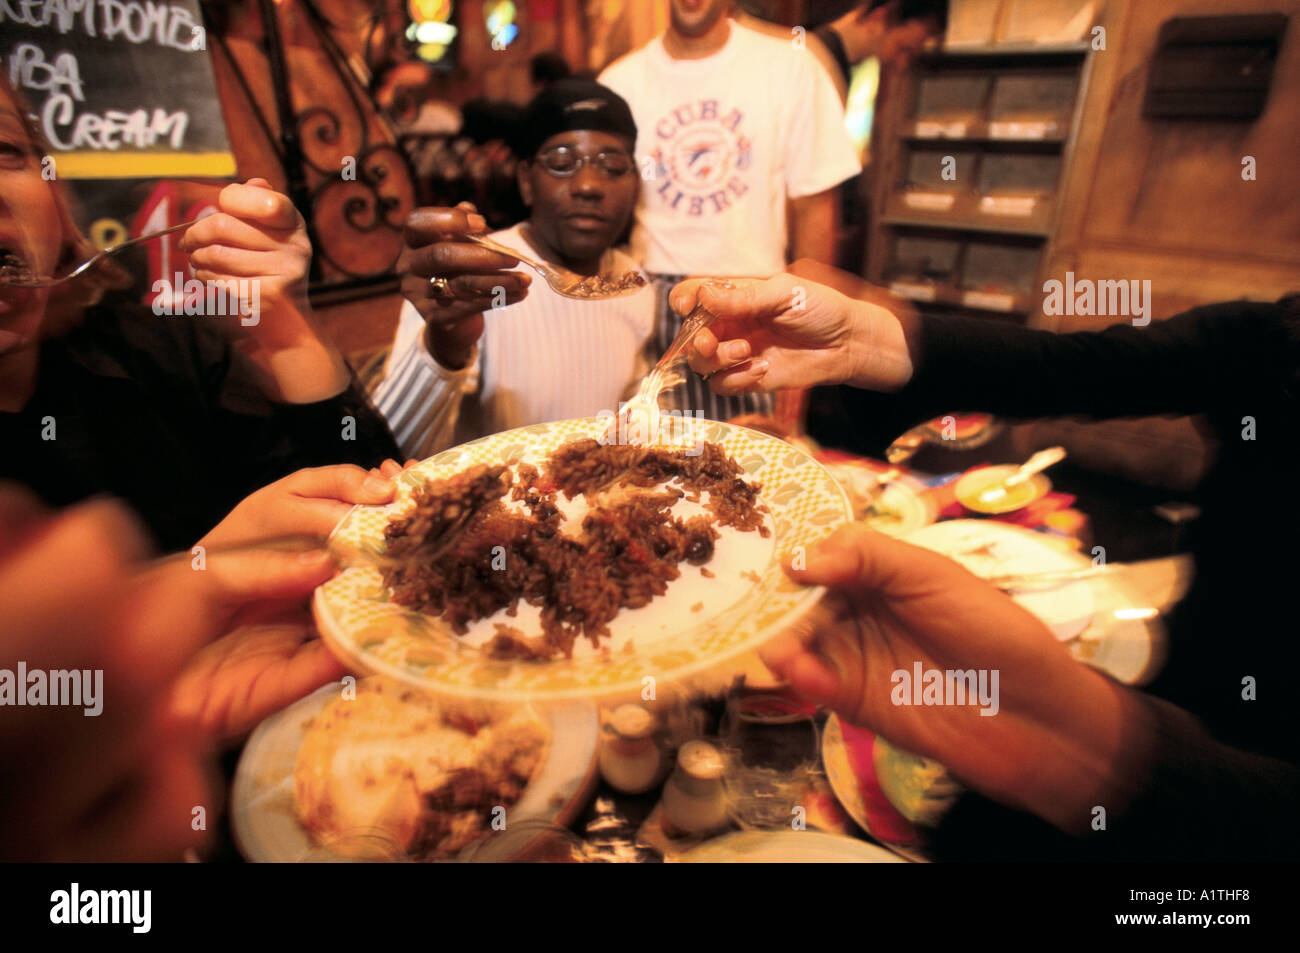 CUBA LIBRE RESTAURANT LONDON 2001 - Stock Image